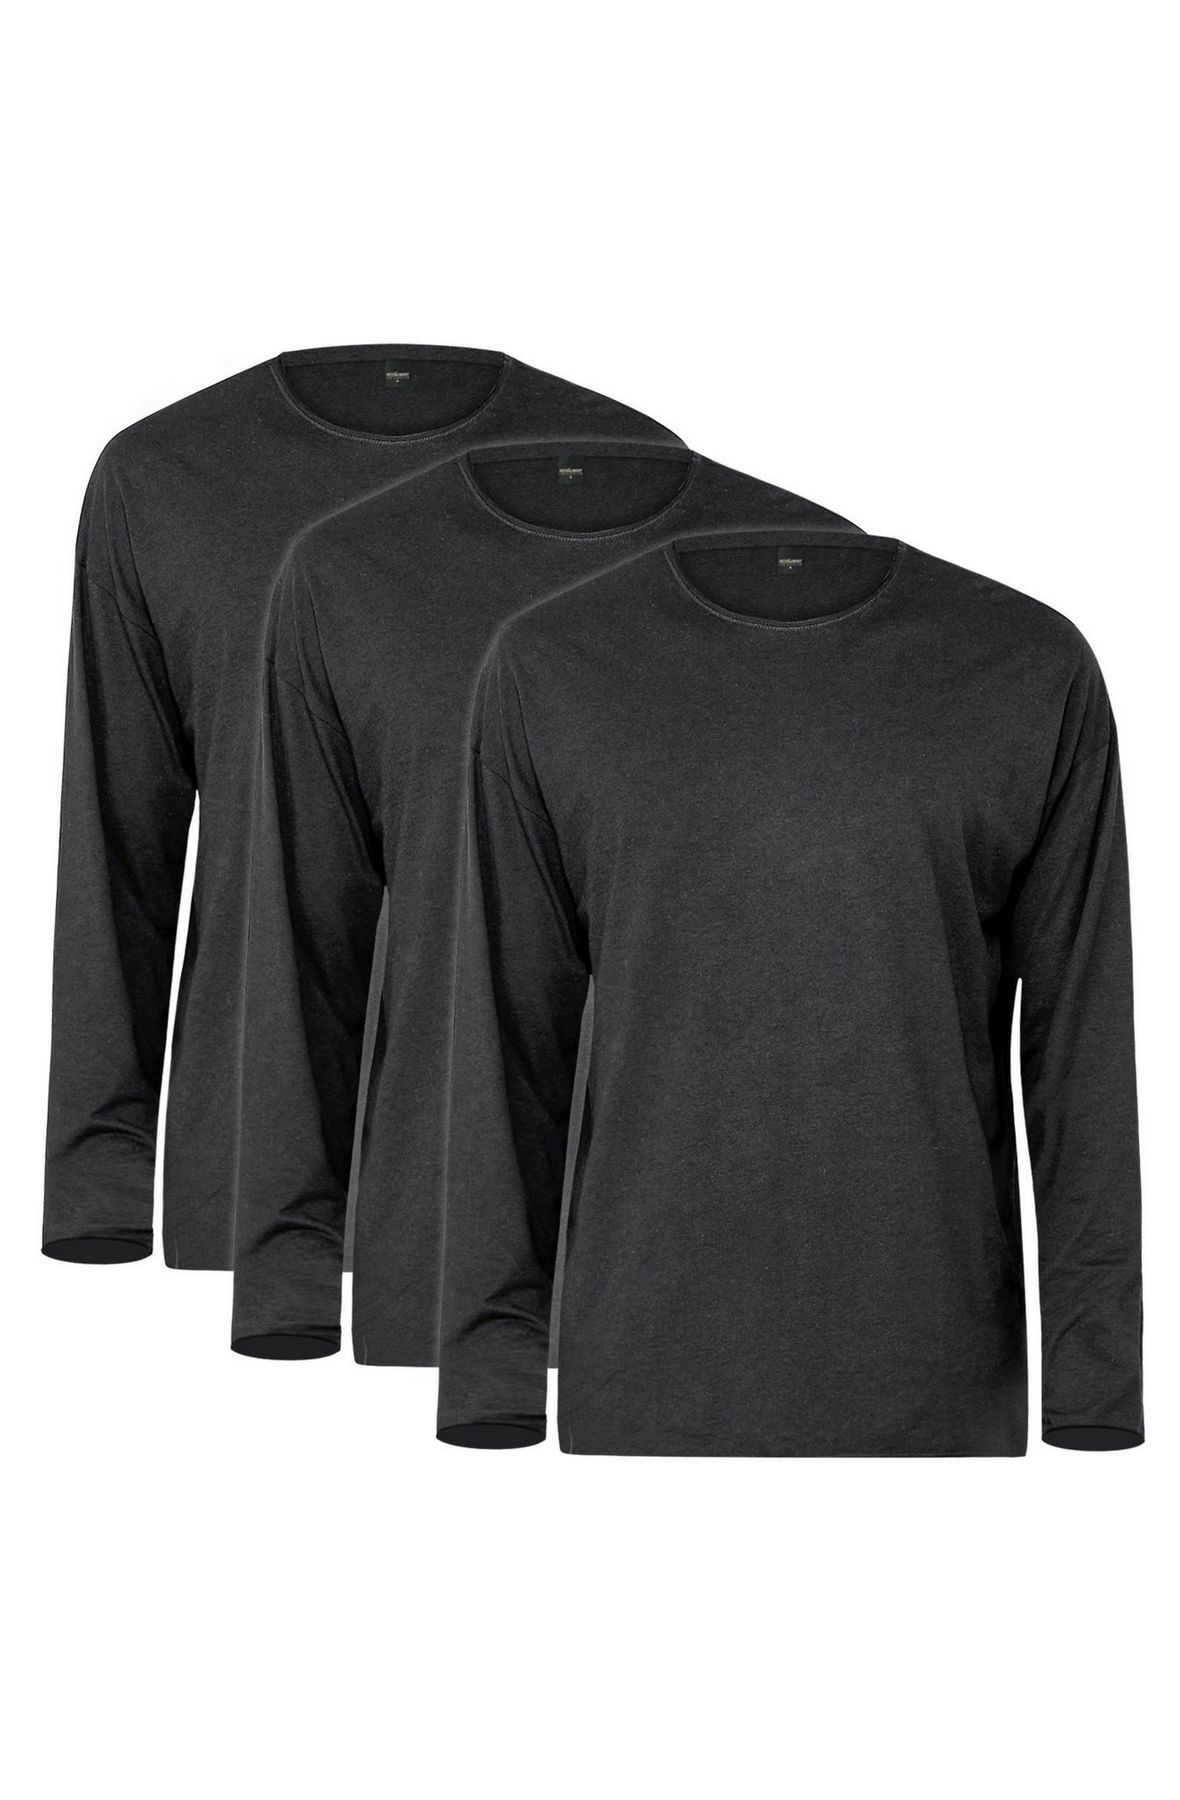 Long Sleeve Raw Hem Tee 3 Pack (Charcoal)